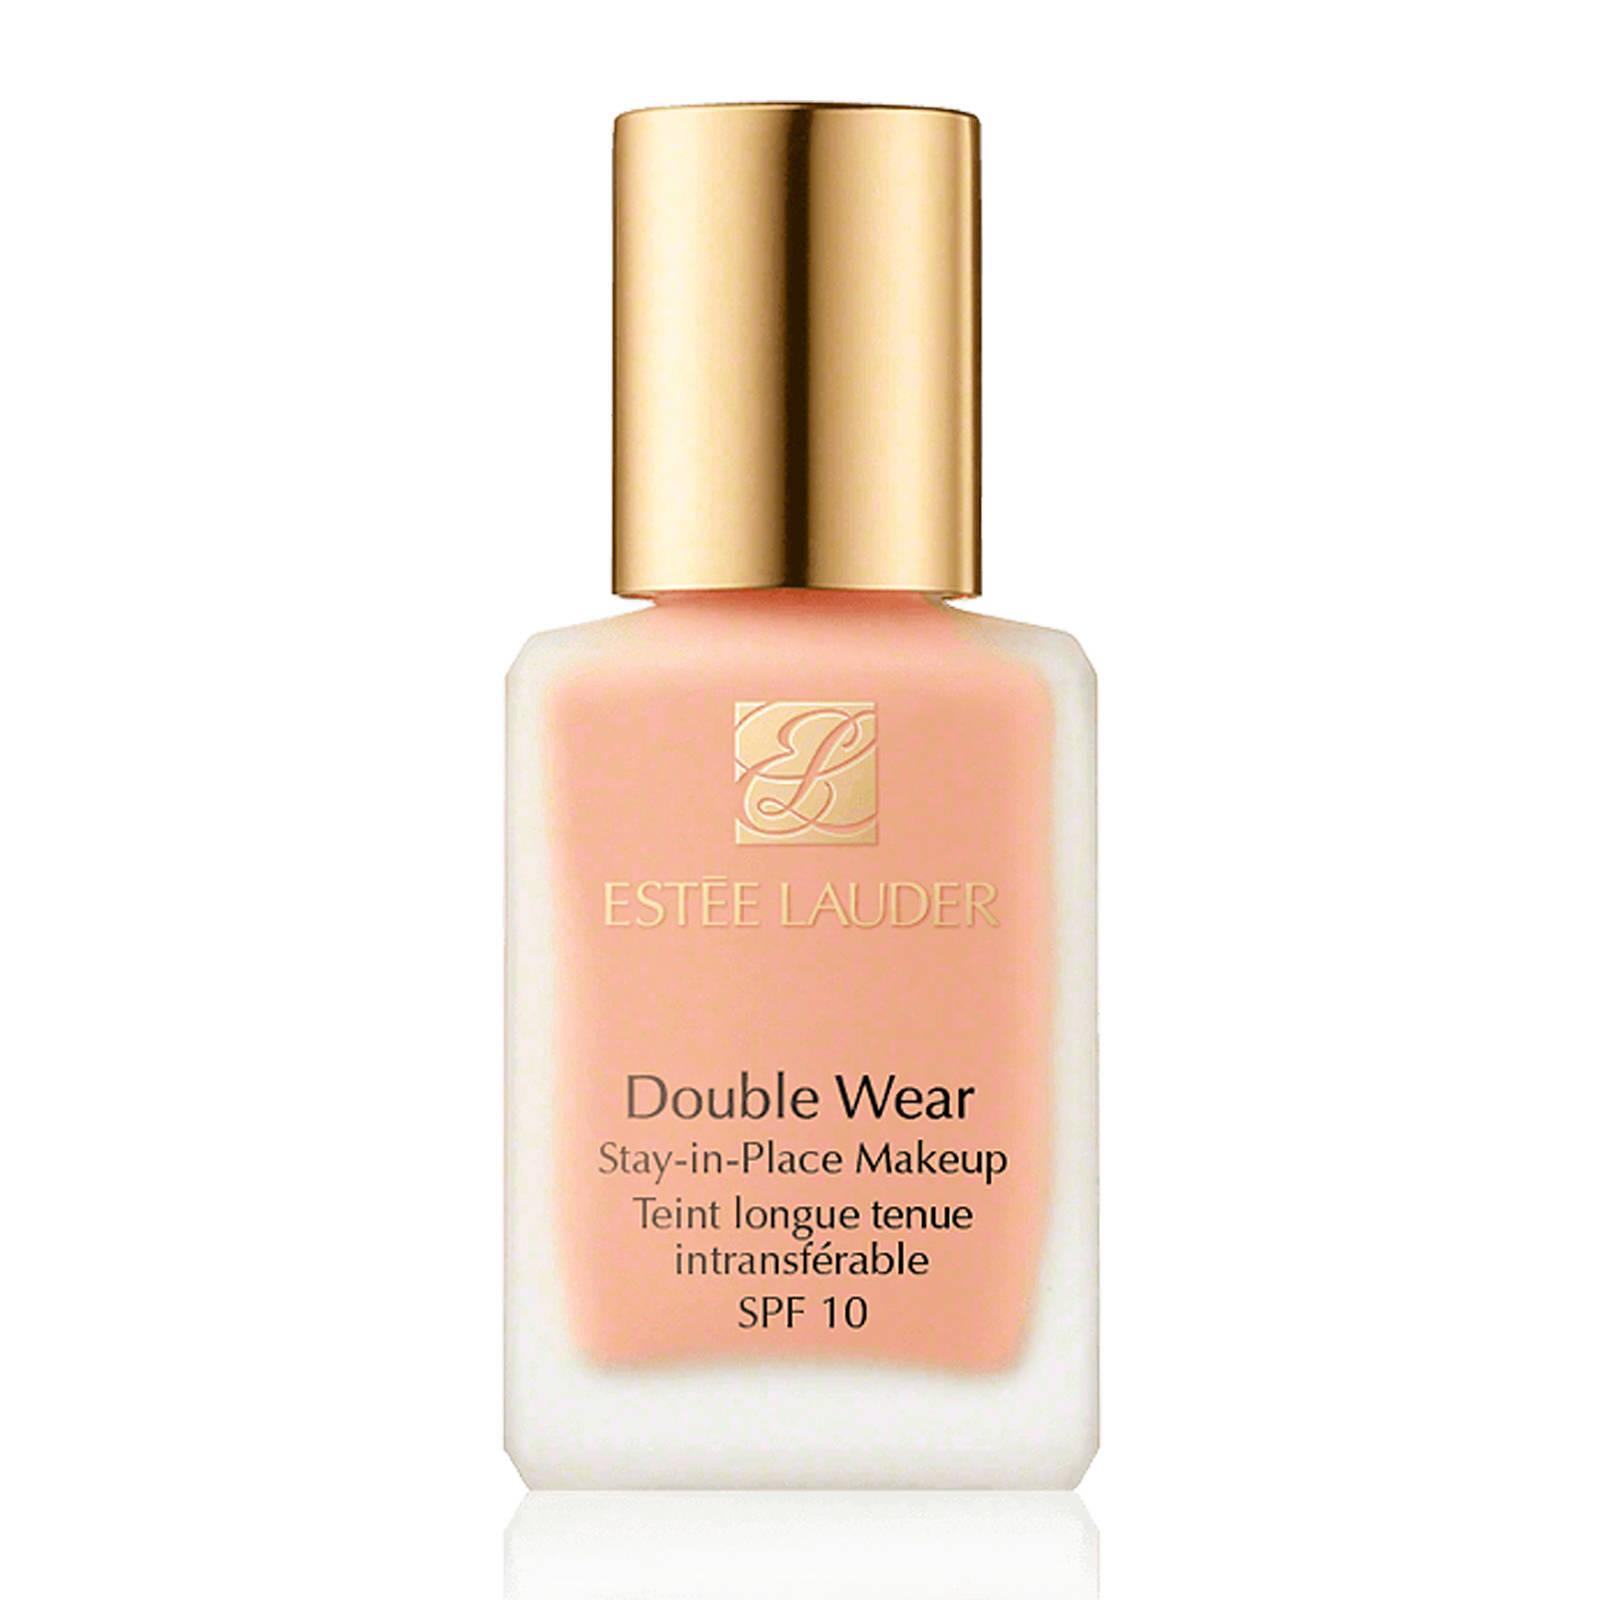 Estée Lauder Double Wear Stay-In-Place Makeup SPF10 foundation - 4C1 Outdoor Beige